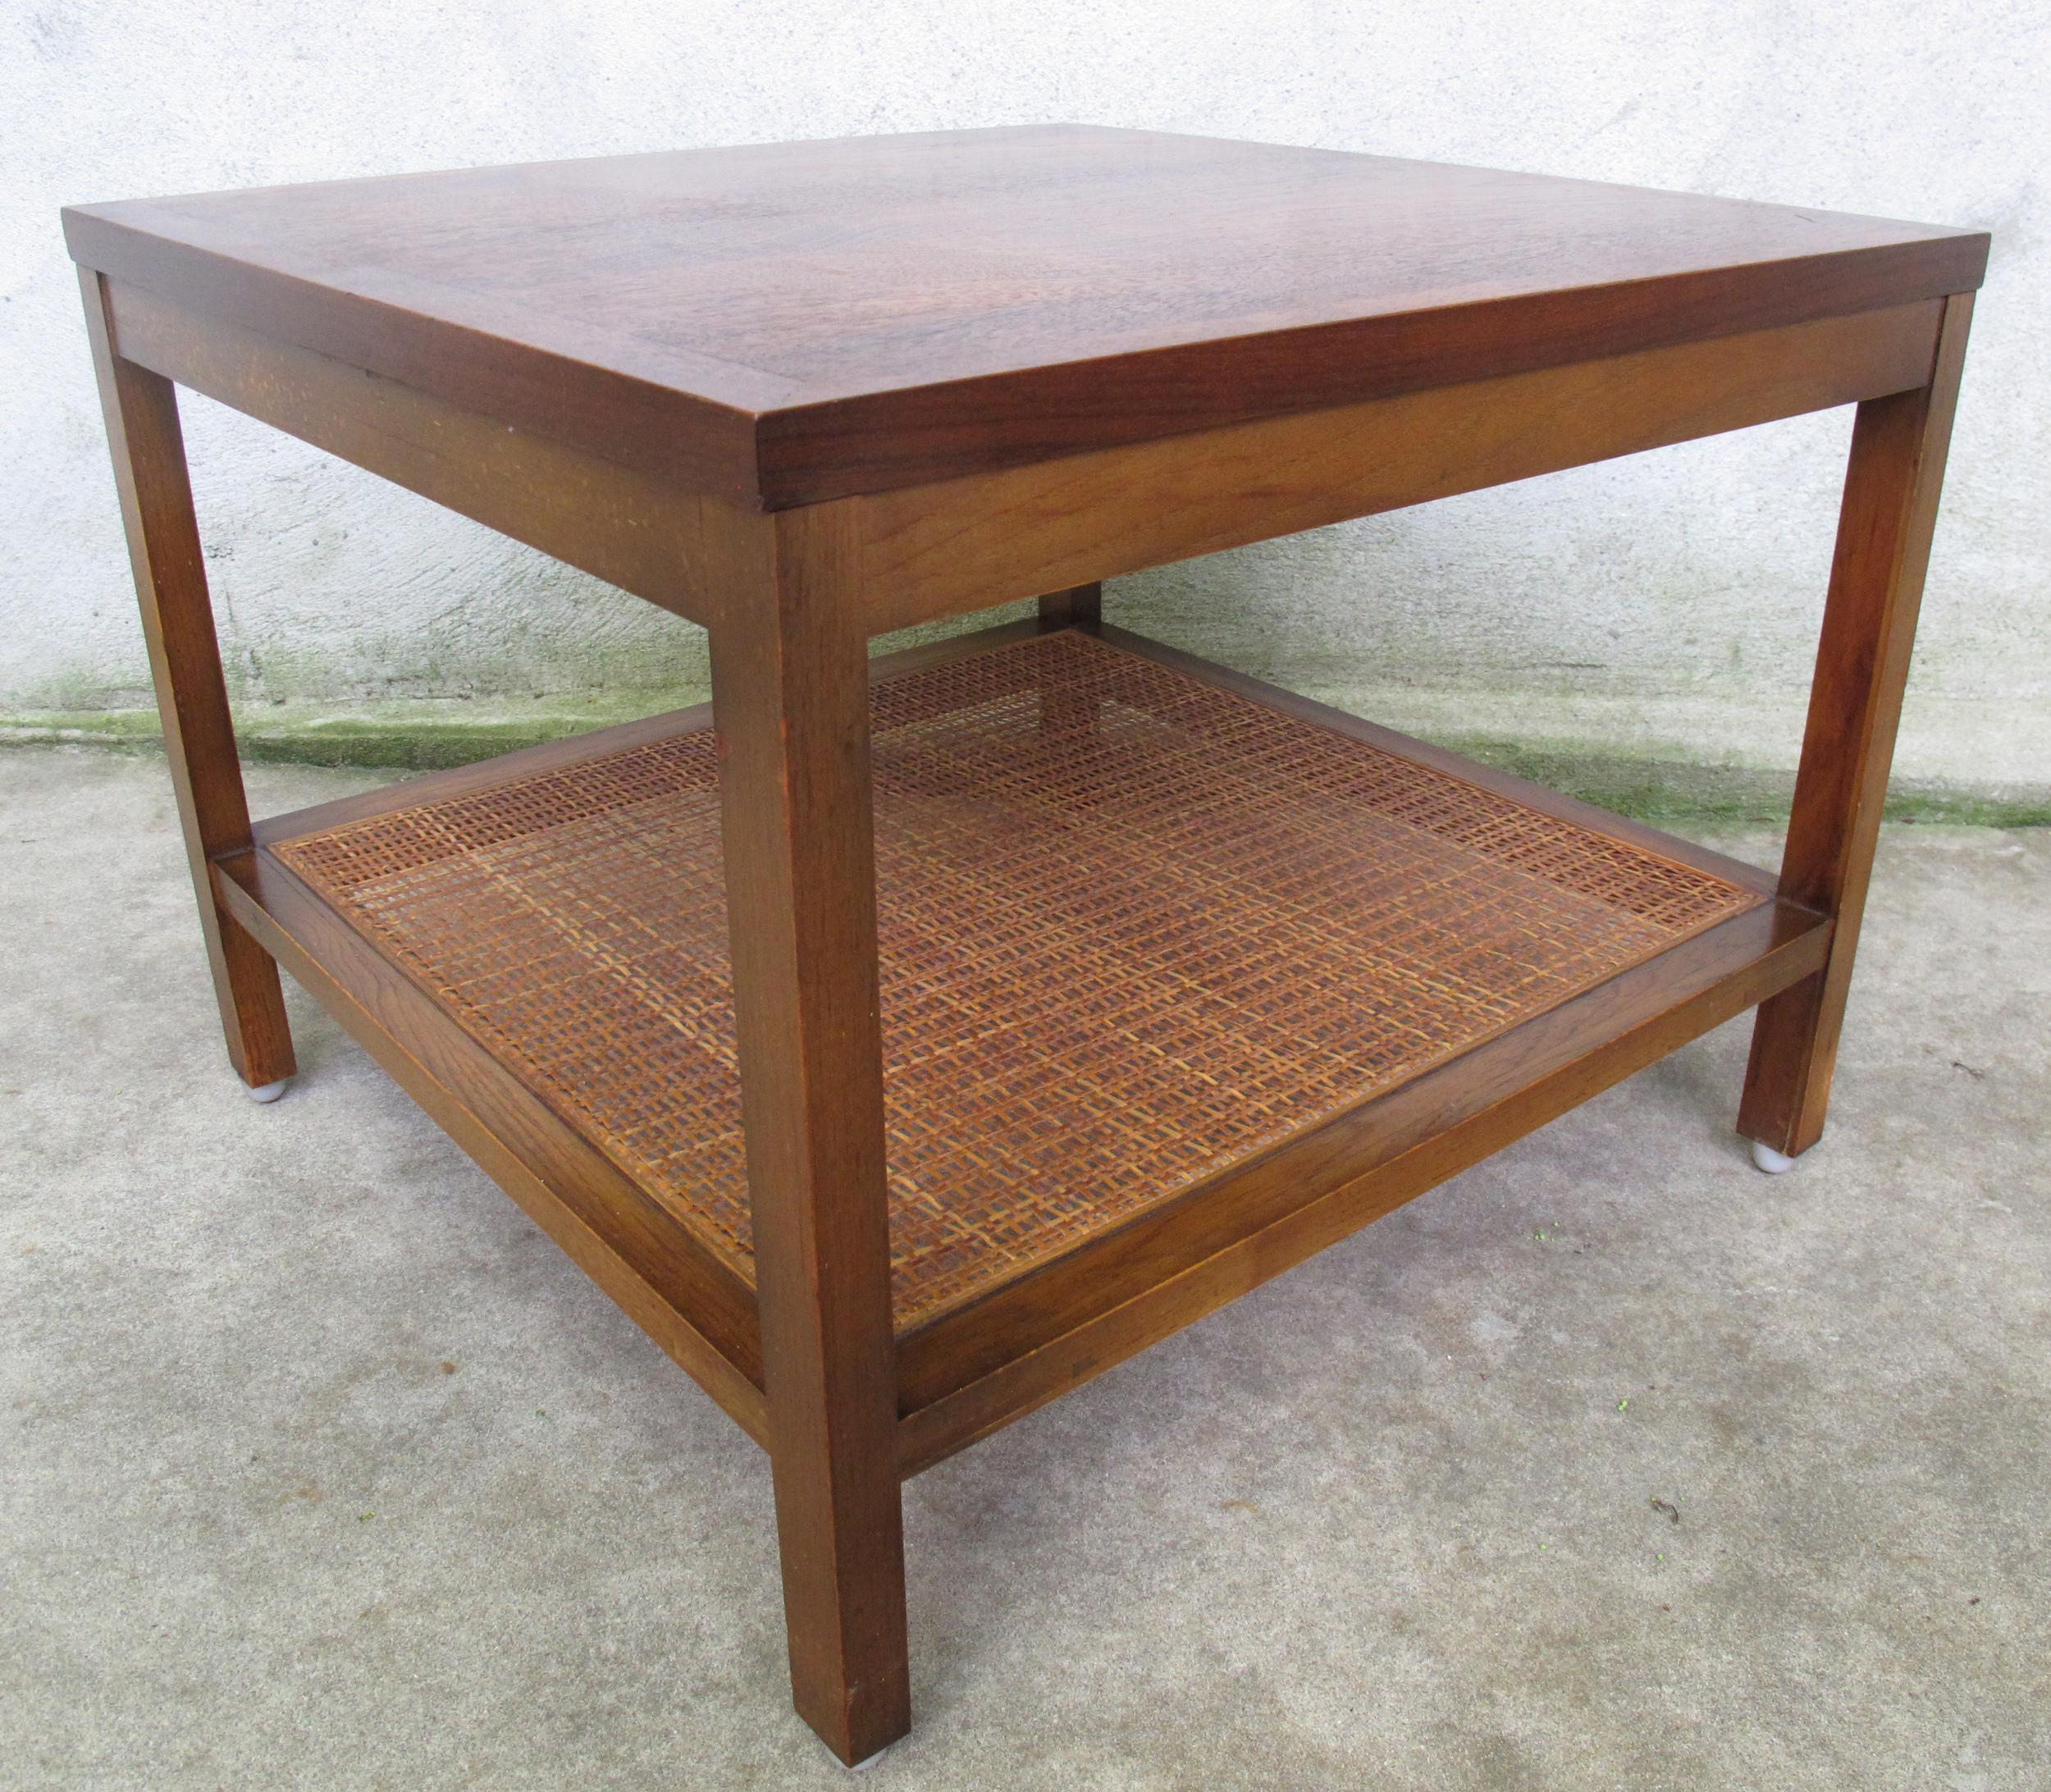 LANE SIDE TABLE BY PAUL MCCOBB